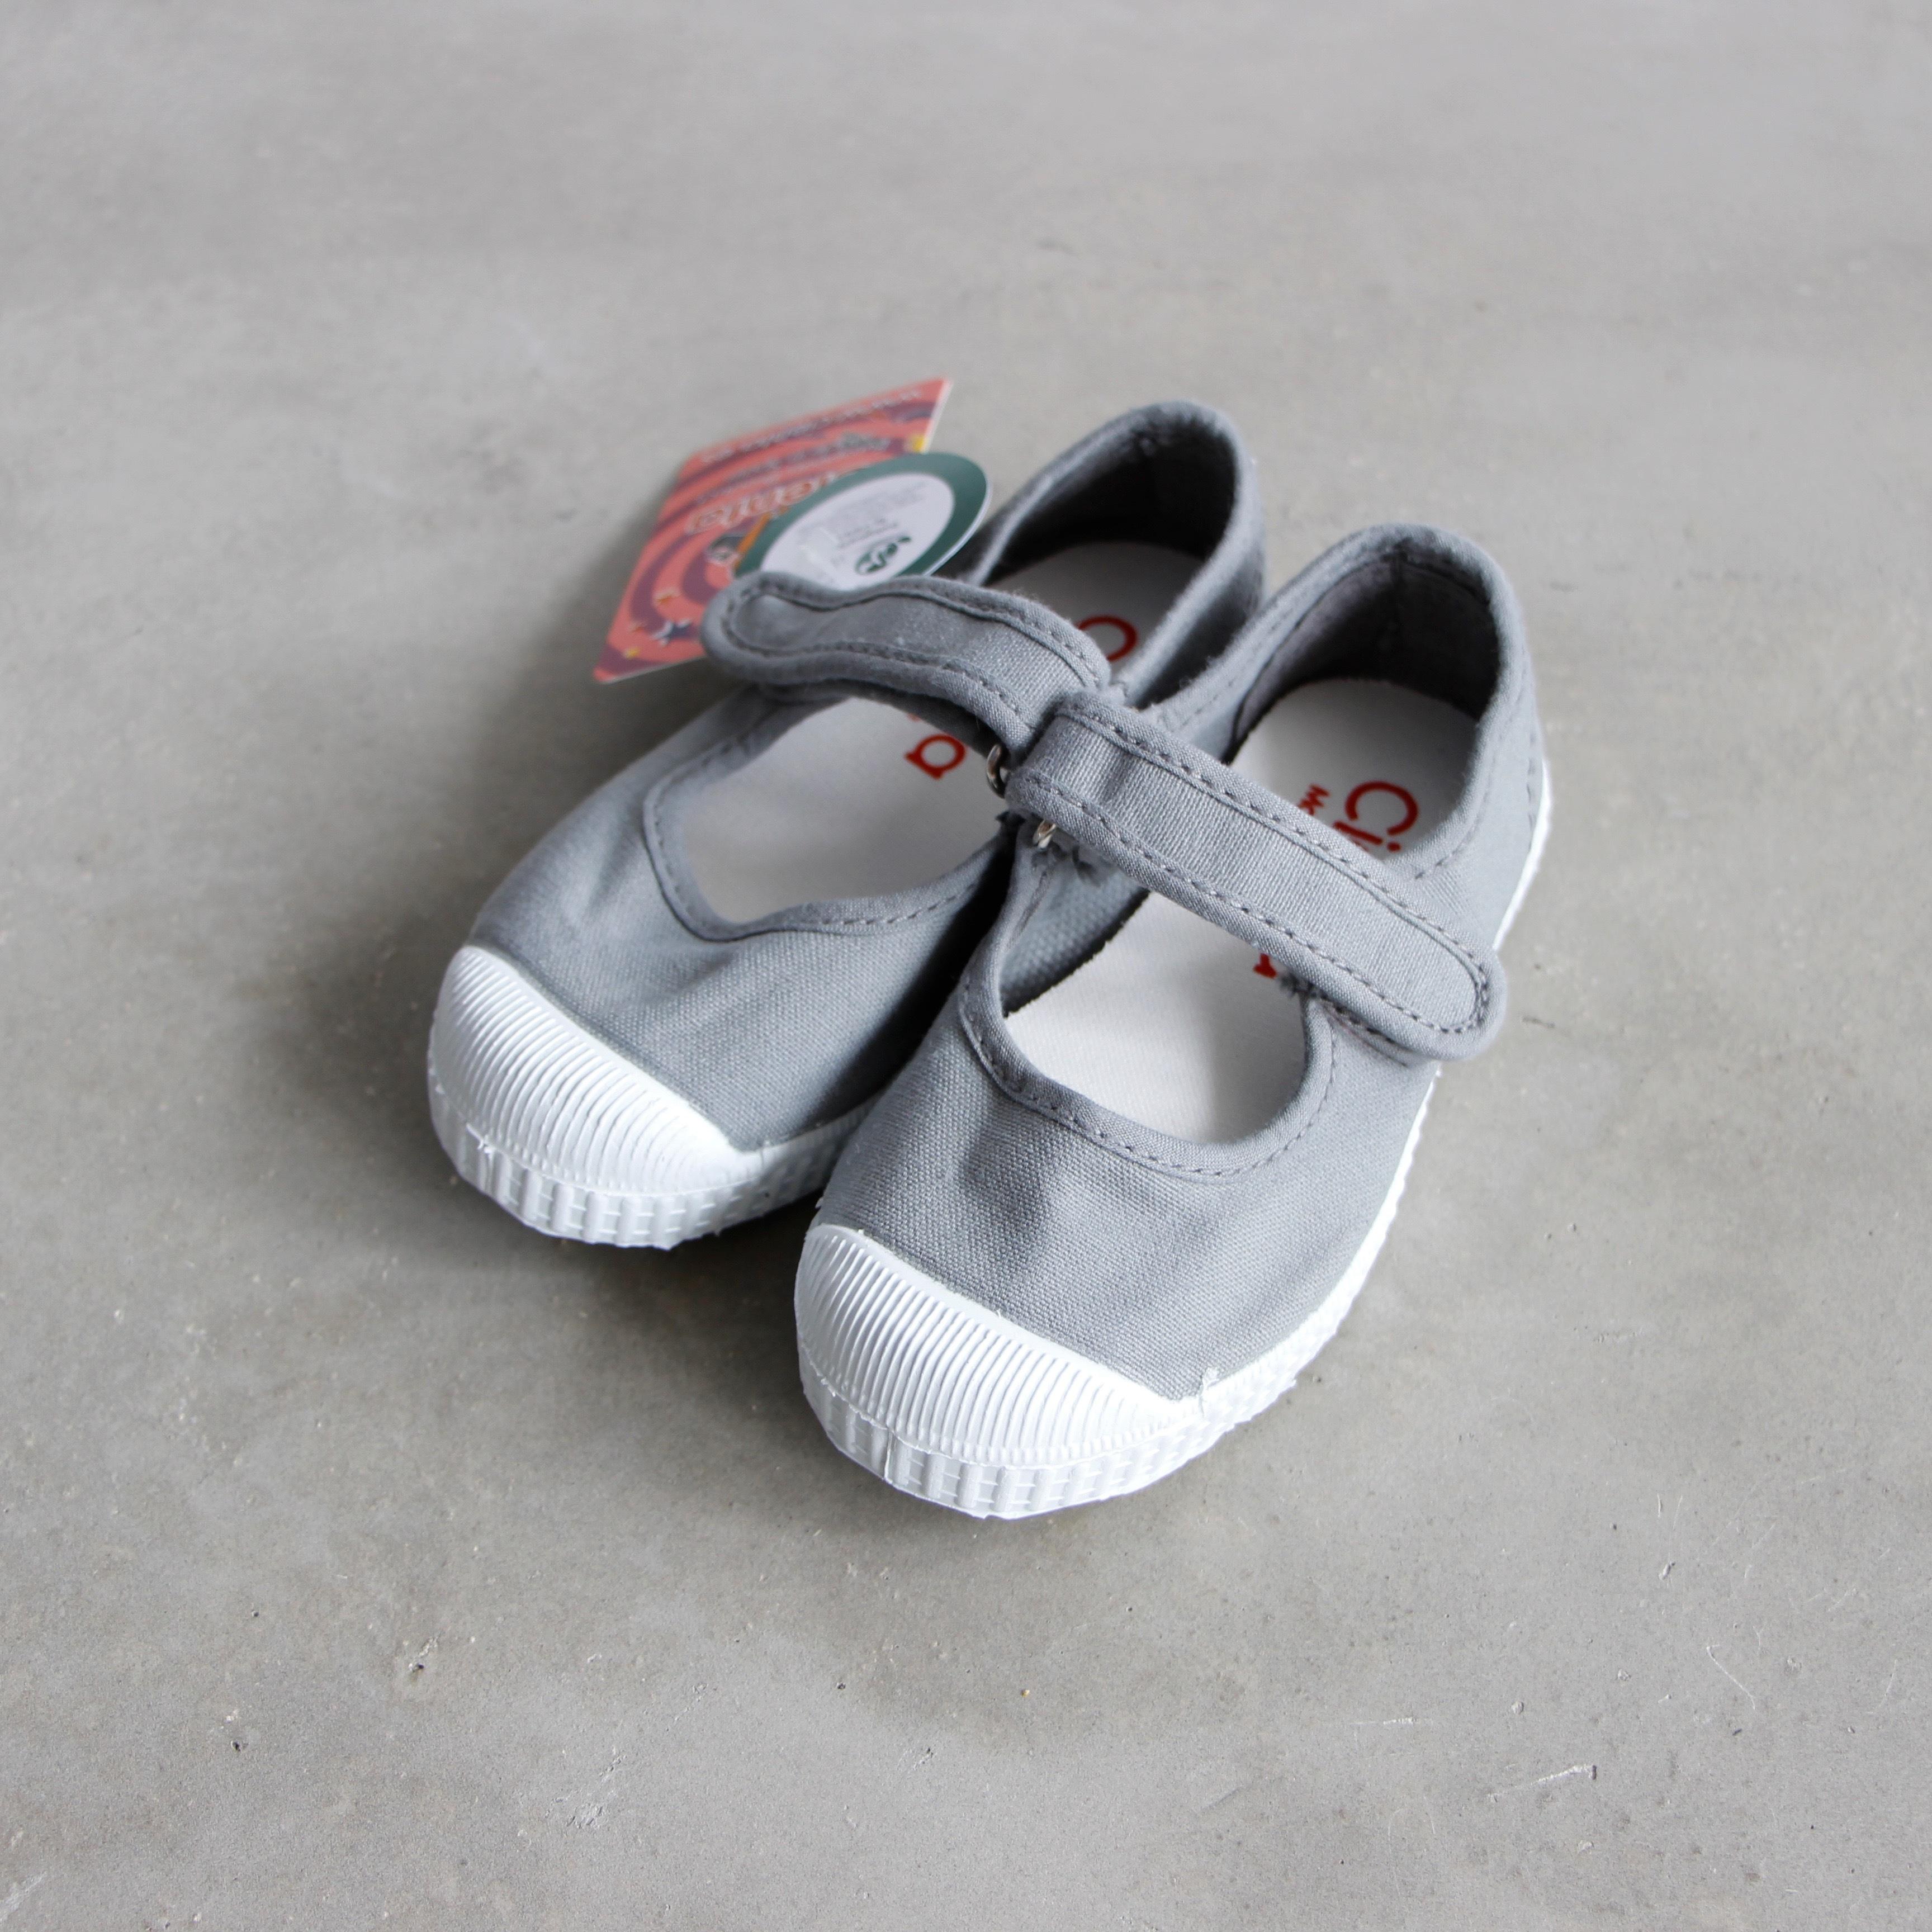 《CIENTA》ベルクロワンストラップ / GRIS(gray) / 12.5〜20cm